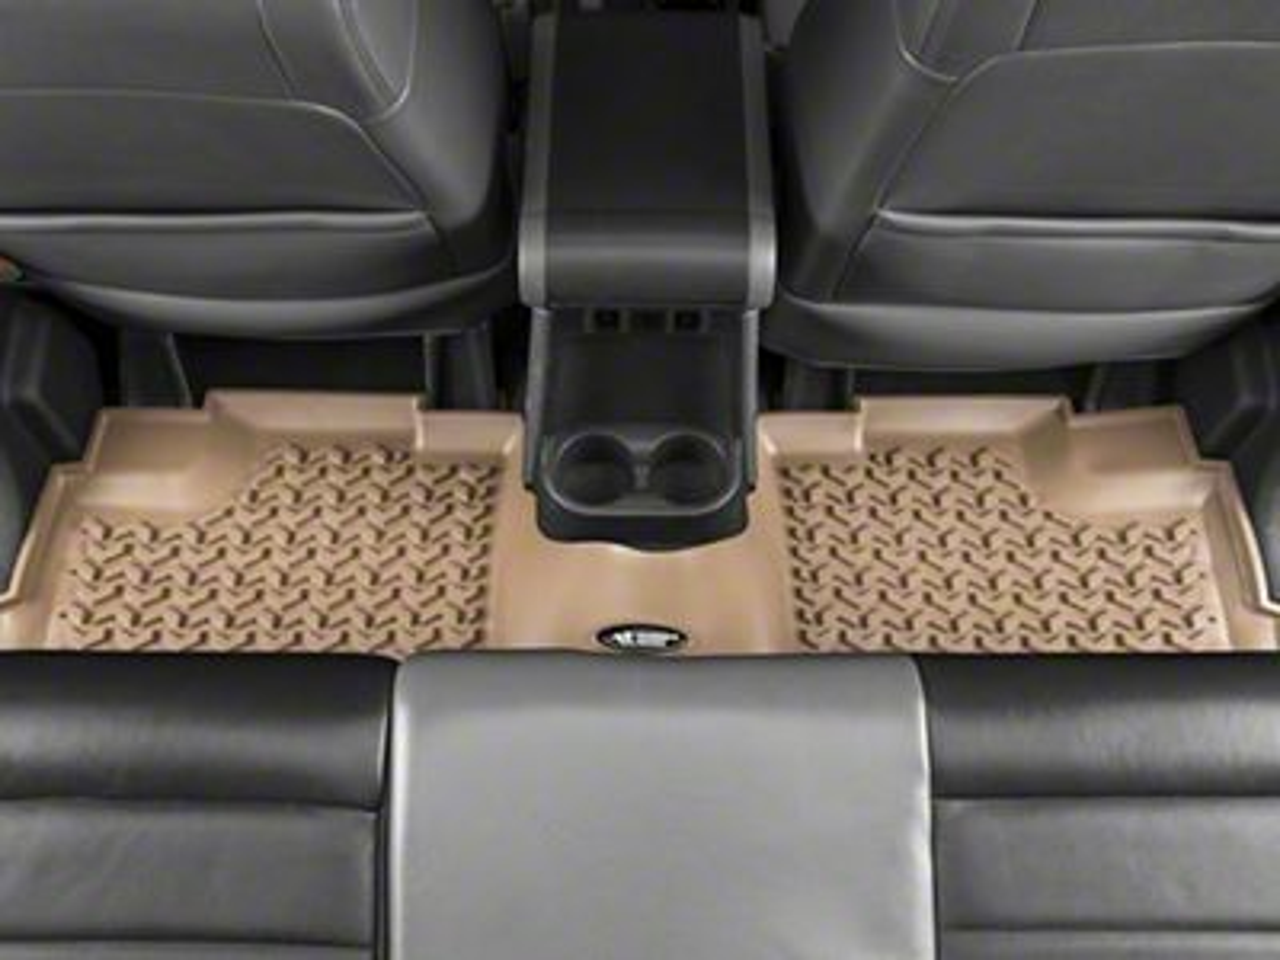 Rugged Ridge All-Terrain Rear Floor Mat - Tan (07-18 Jeep Wrangler JK 4 Door)